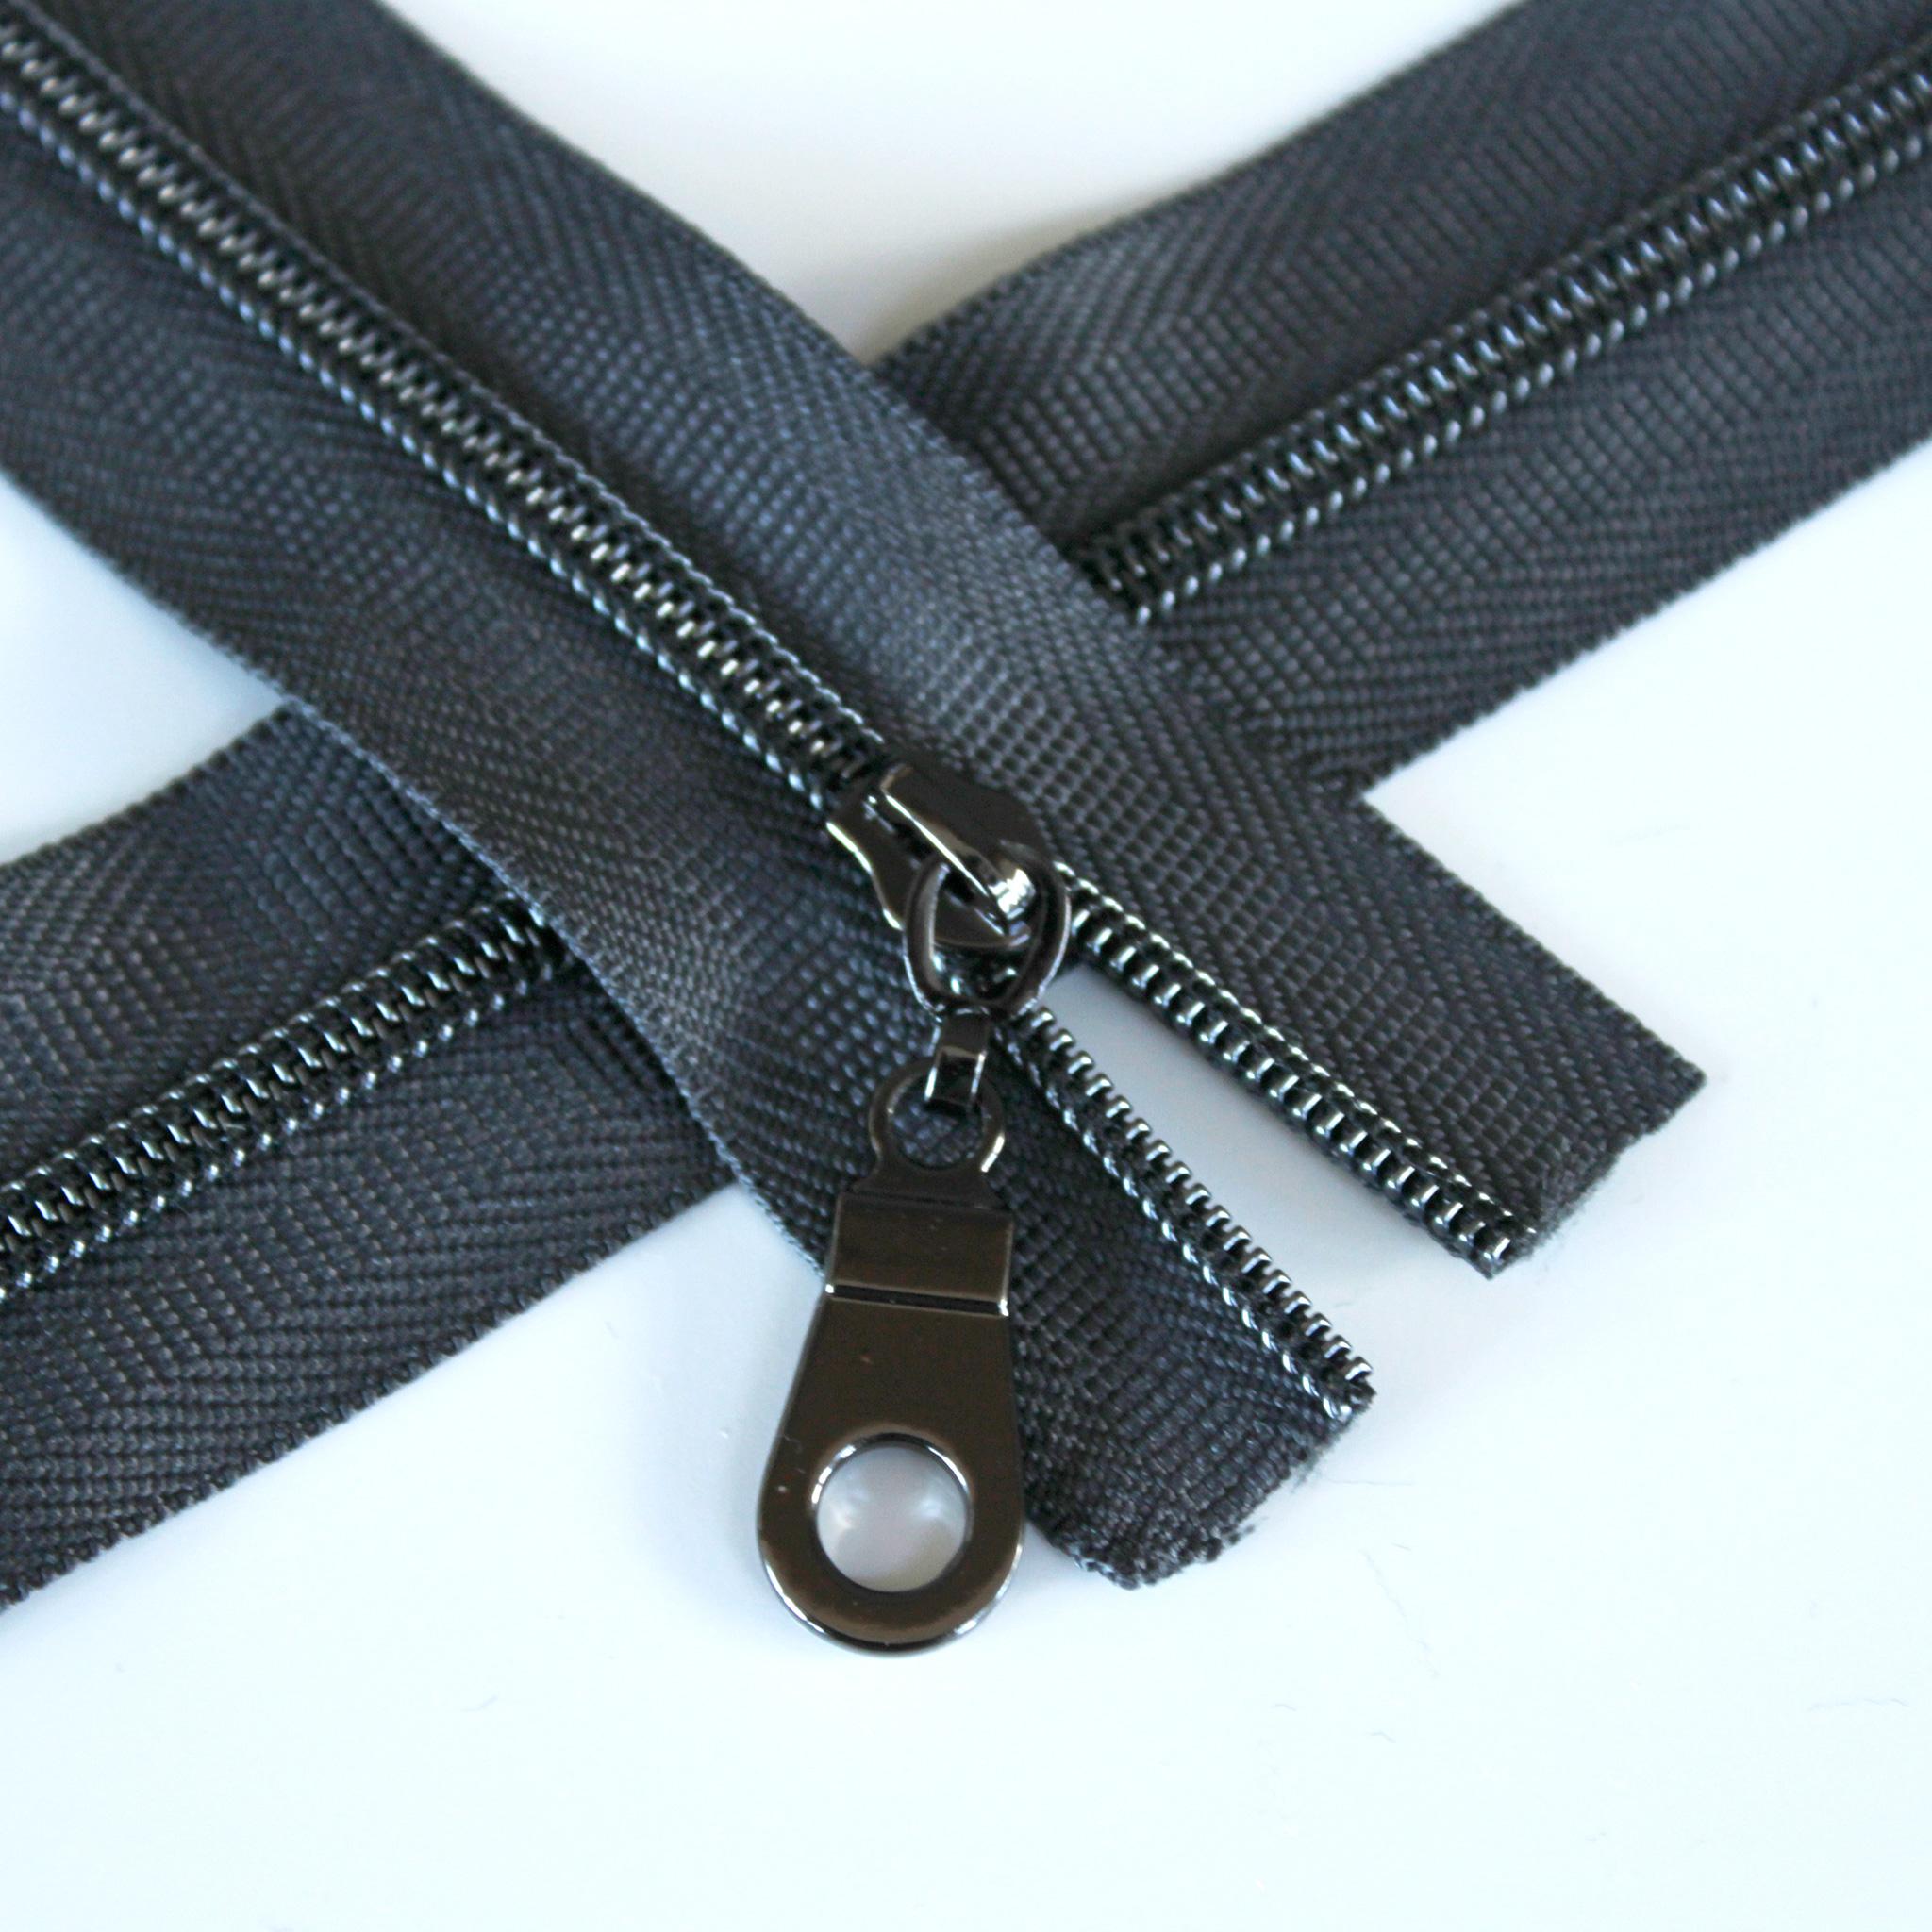 3-Nylon-Coil-Zipper-charcoal-with-gunmetal-teeth